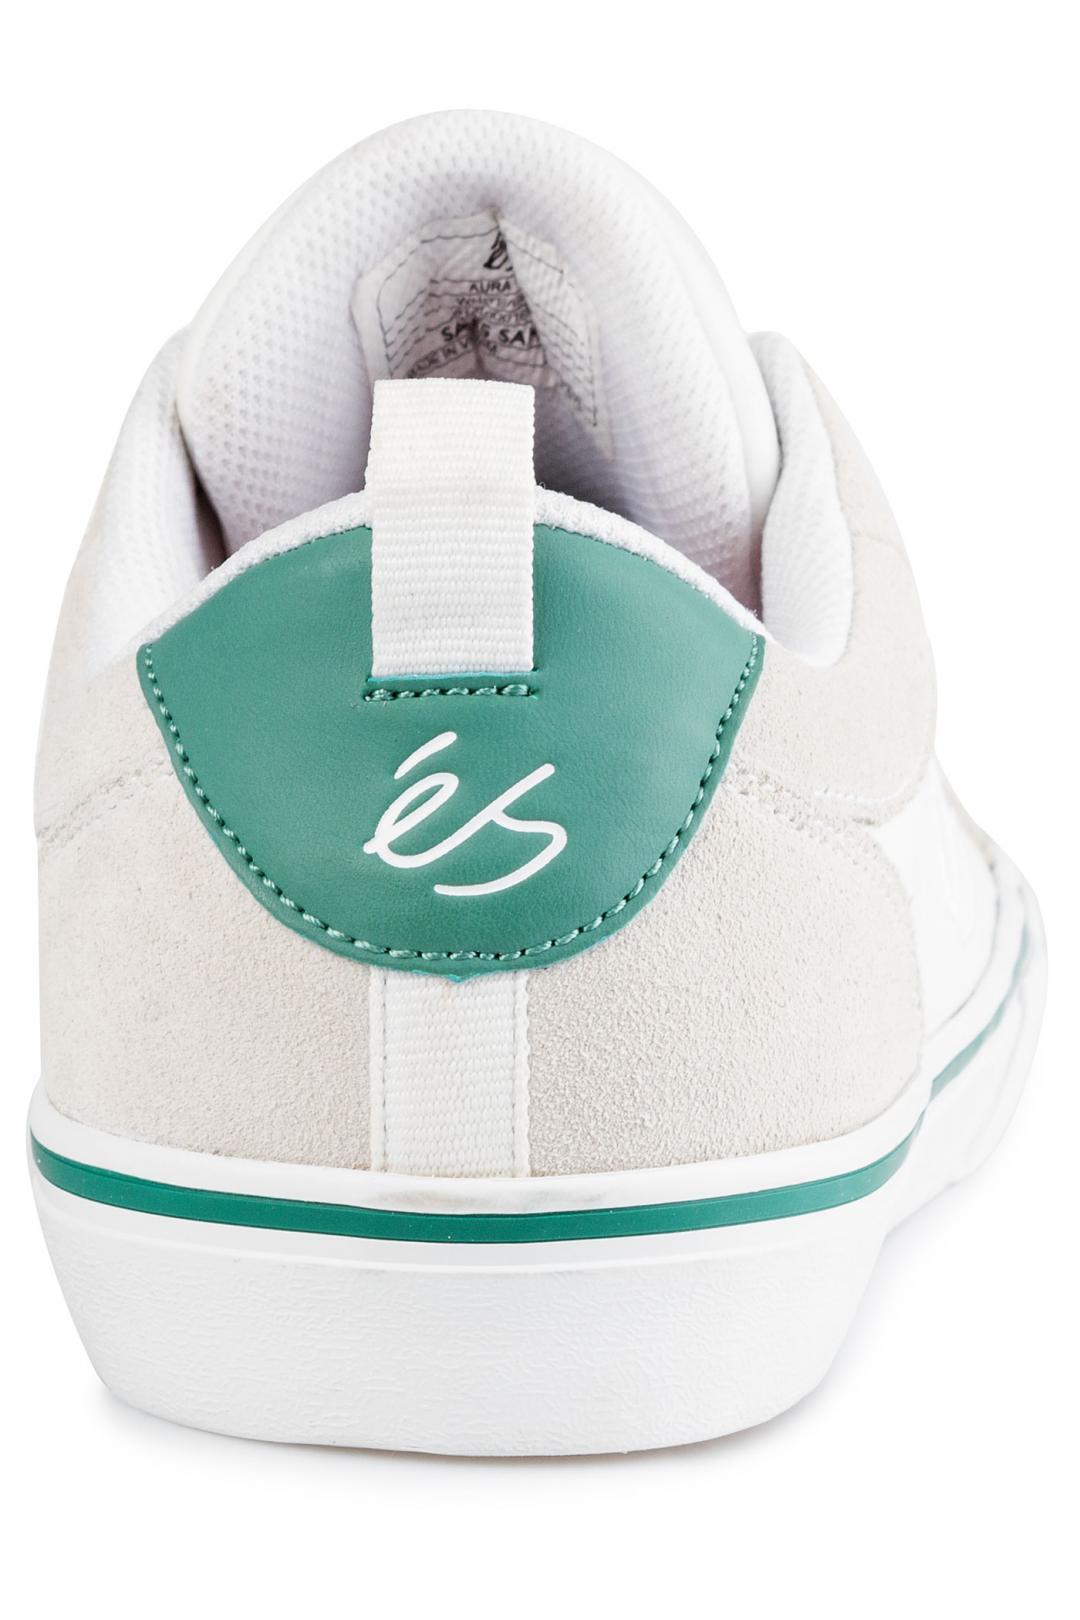 Uomo éS Aura Vulc white green   Sneaker